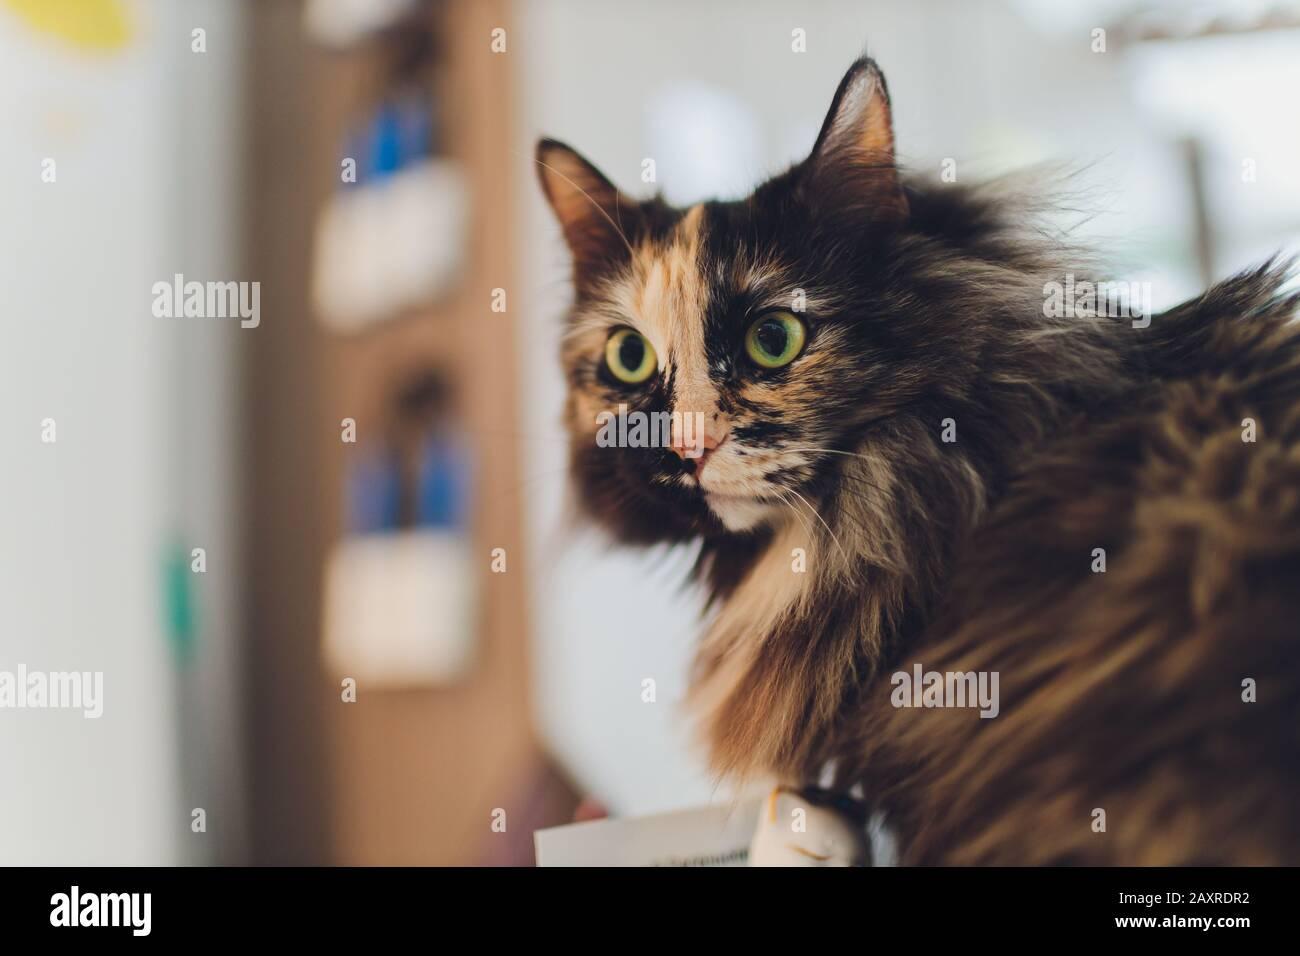 Gatito, gato descansando sobre un flor en fondo de color borroso, lindo gato divertido de cerca, joven gato juguetón en casa, doméstico, relajante, descanso, jugar en Foto de stock